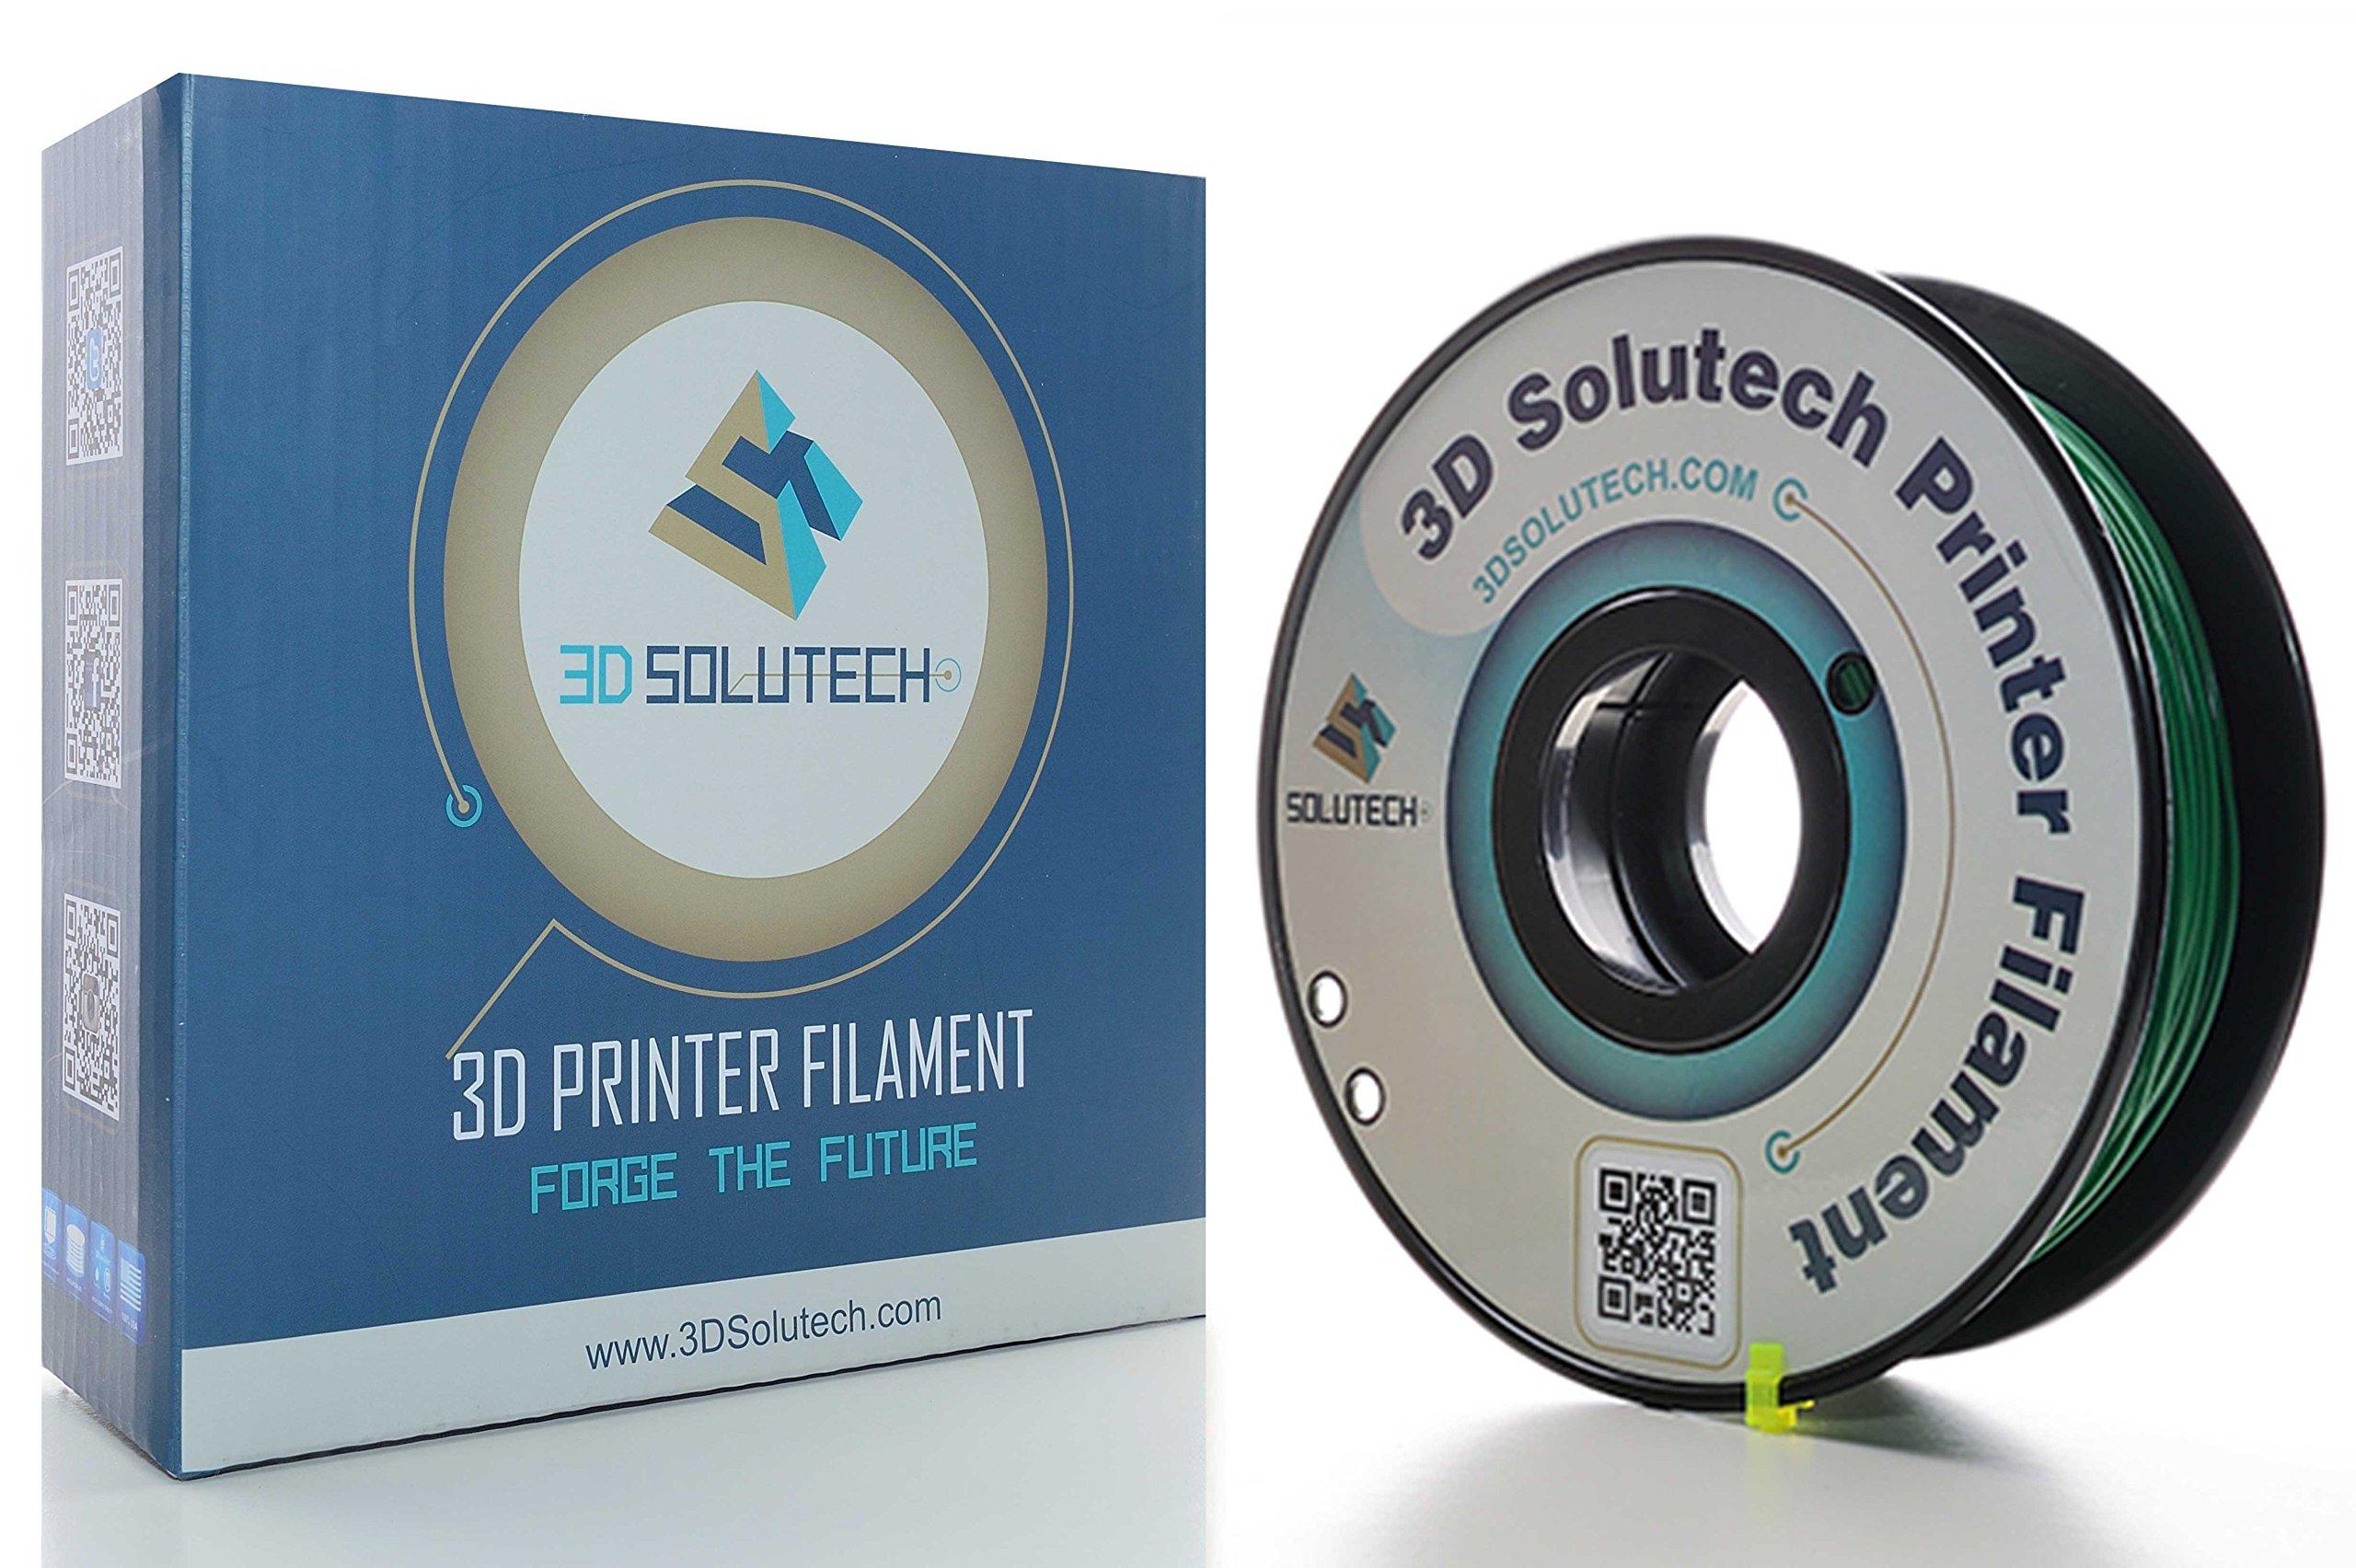 3D Solutech Real Green 3D Printer PLA Filament 1.75MM Filament, Dimensional Accuracy +/- 0.03 mm, 2.2 LBS (1.0KG) - 100% USA